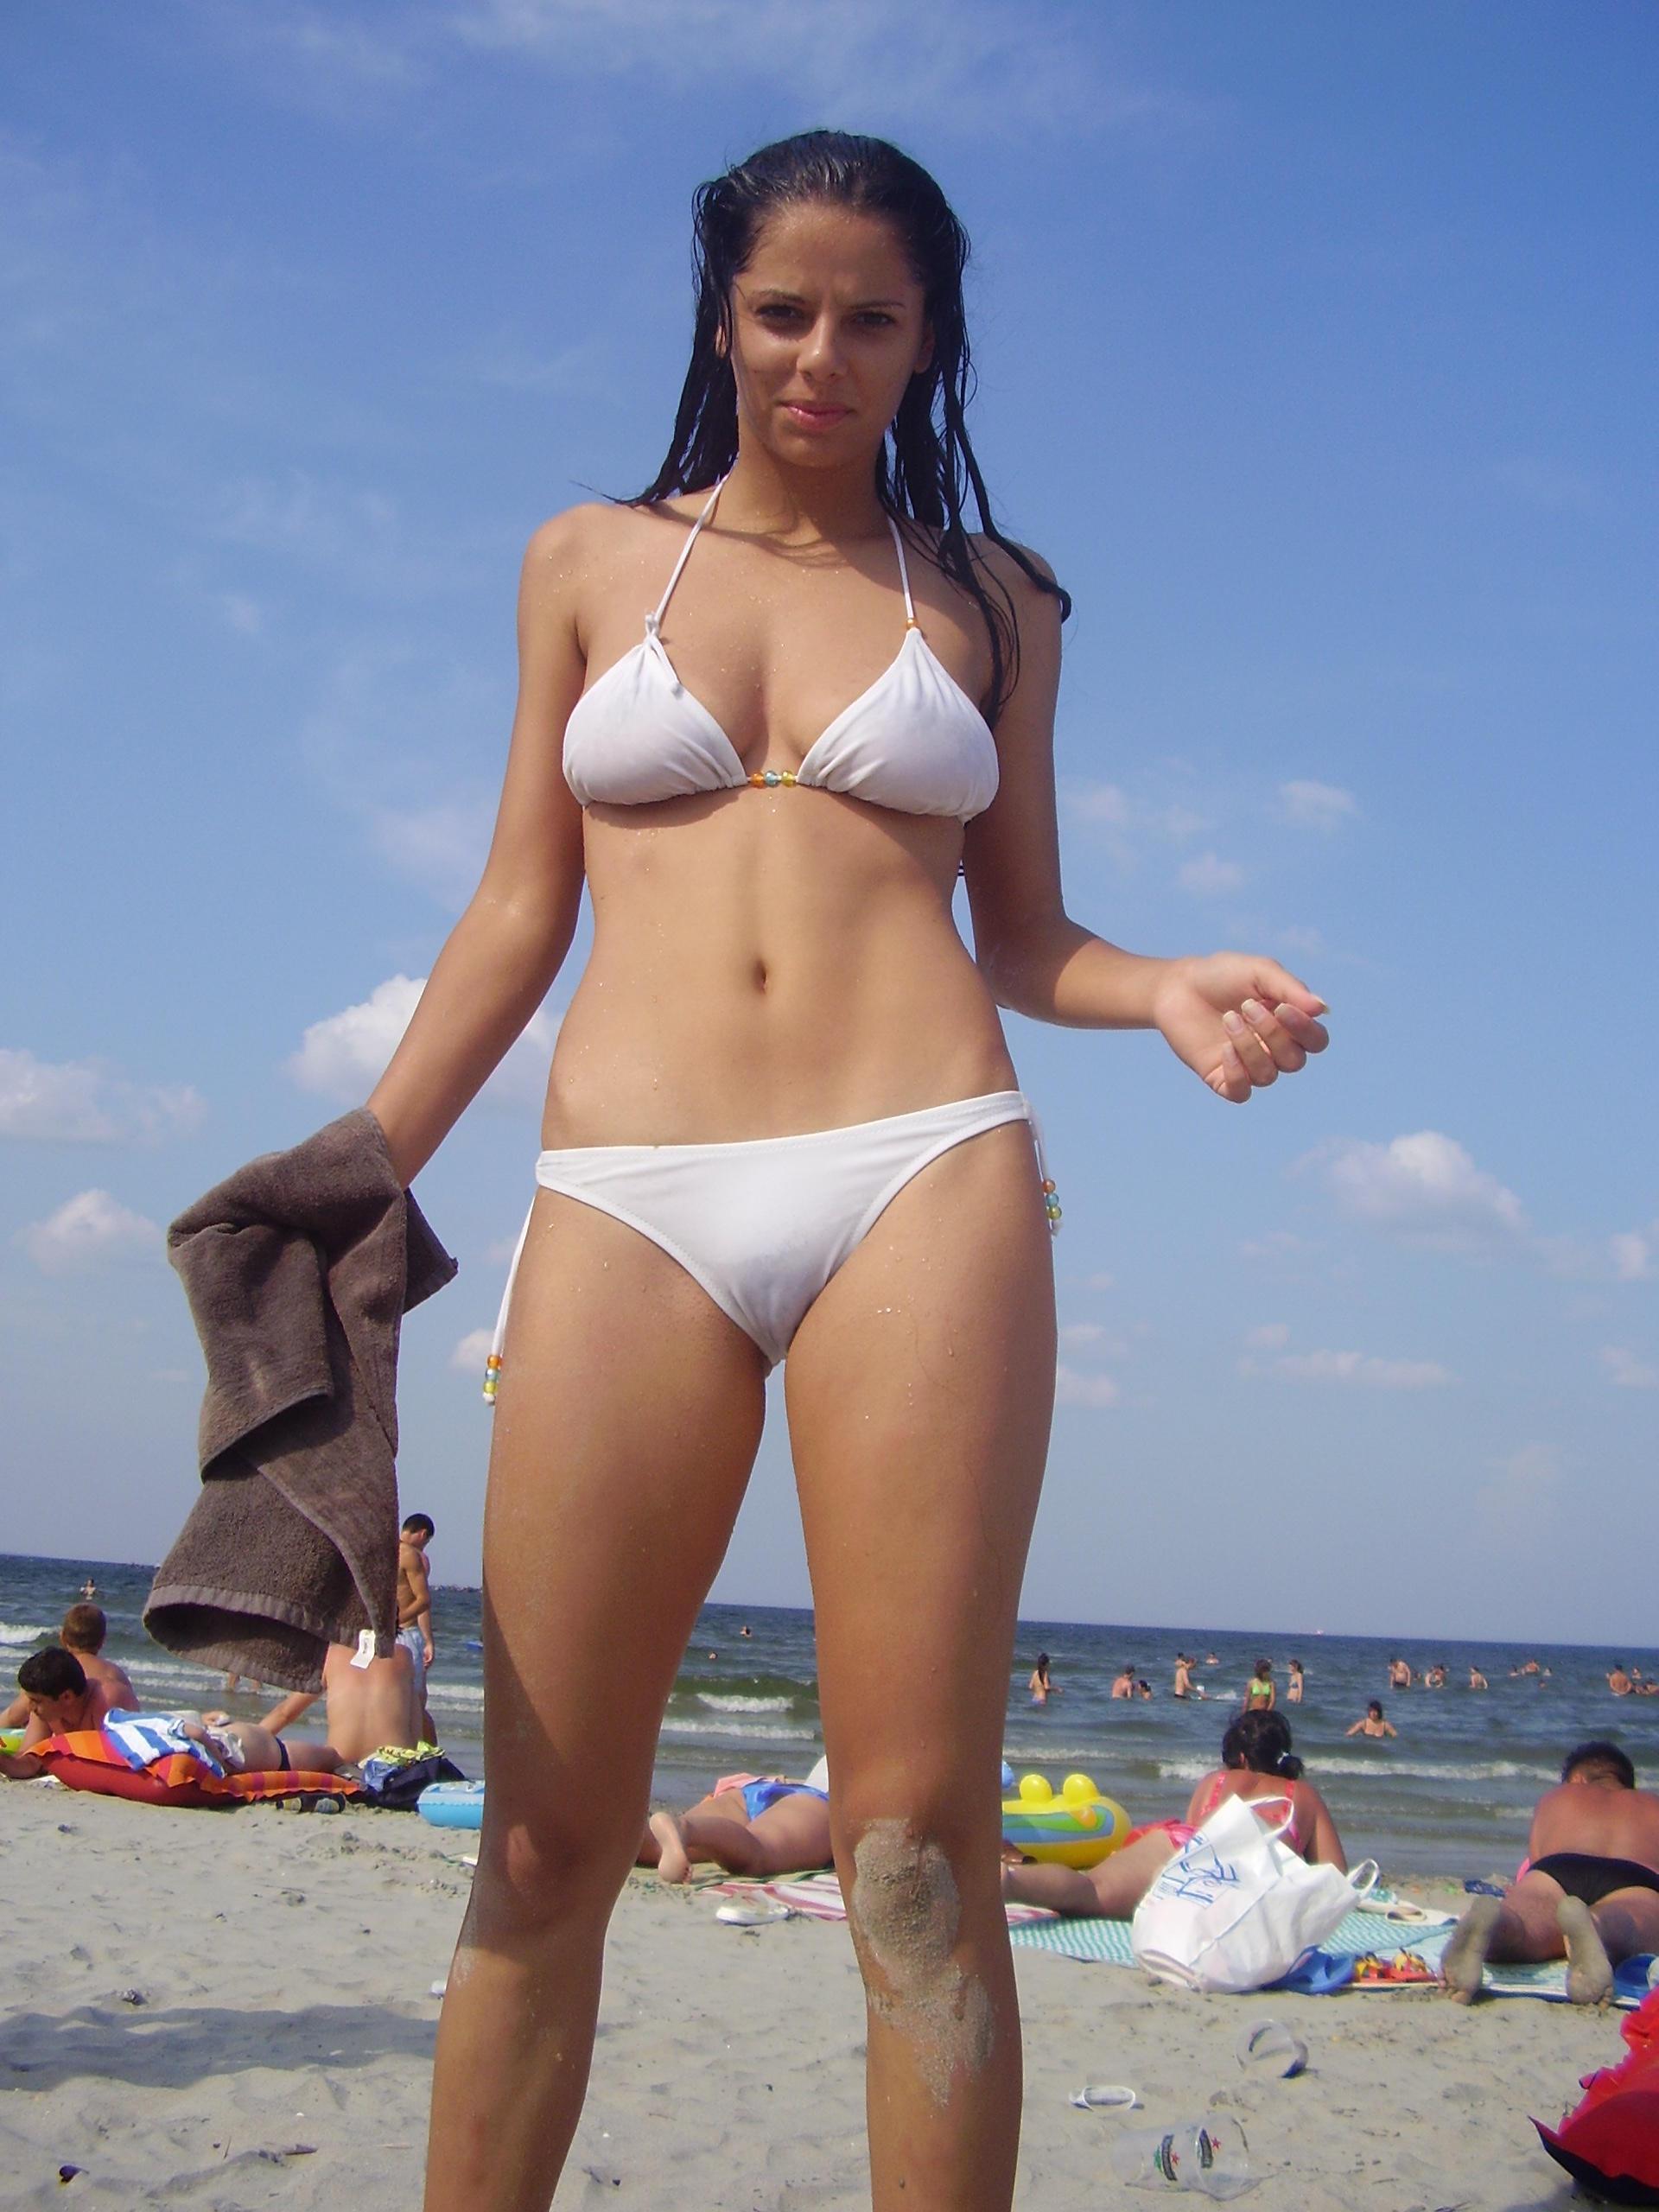 Фото пляж без бикини 14 фотография